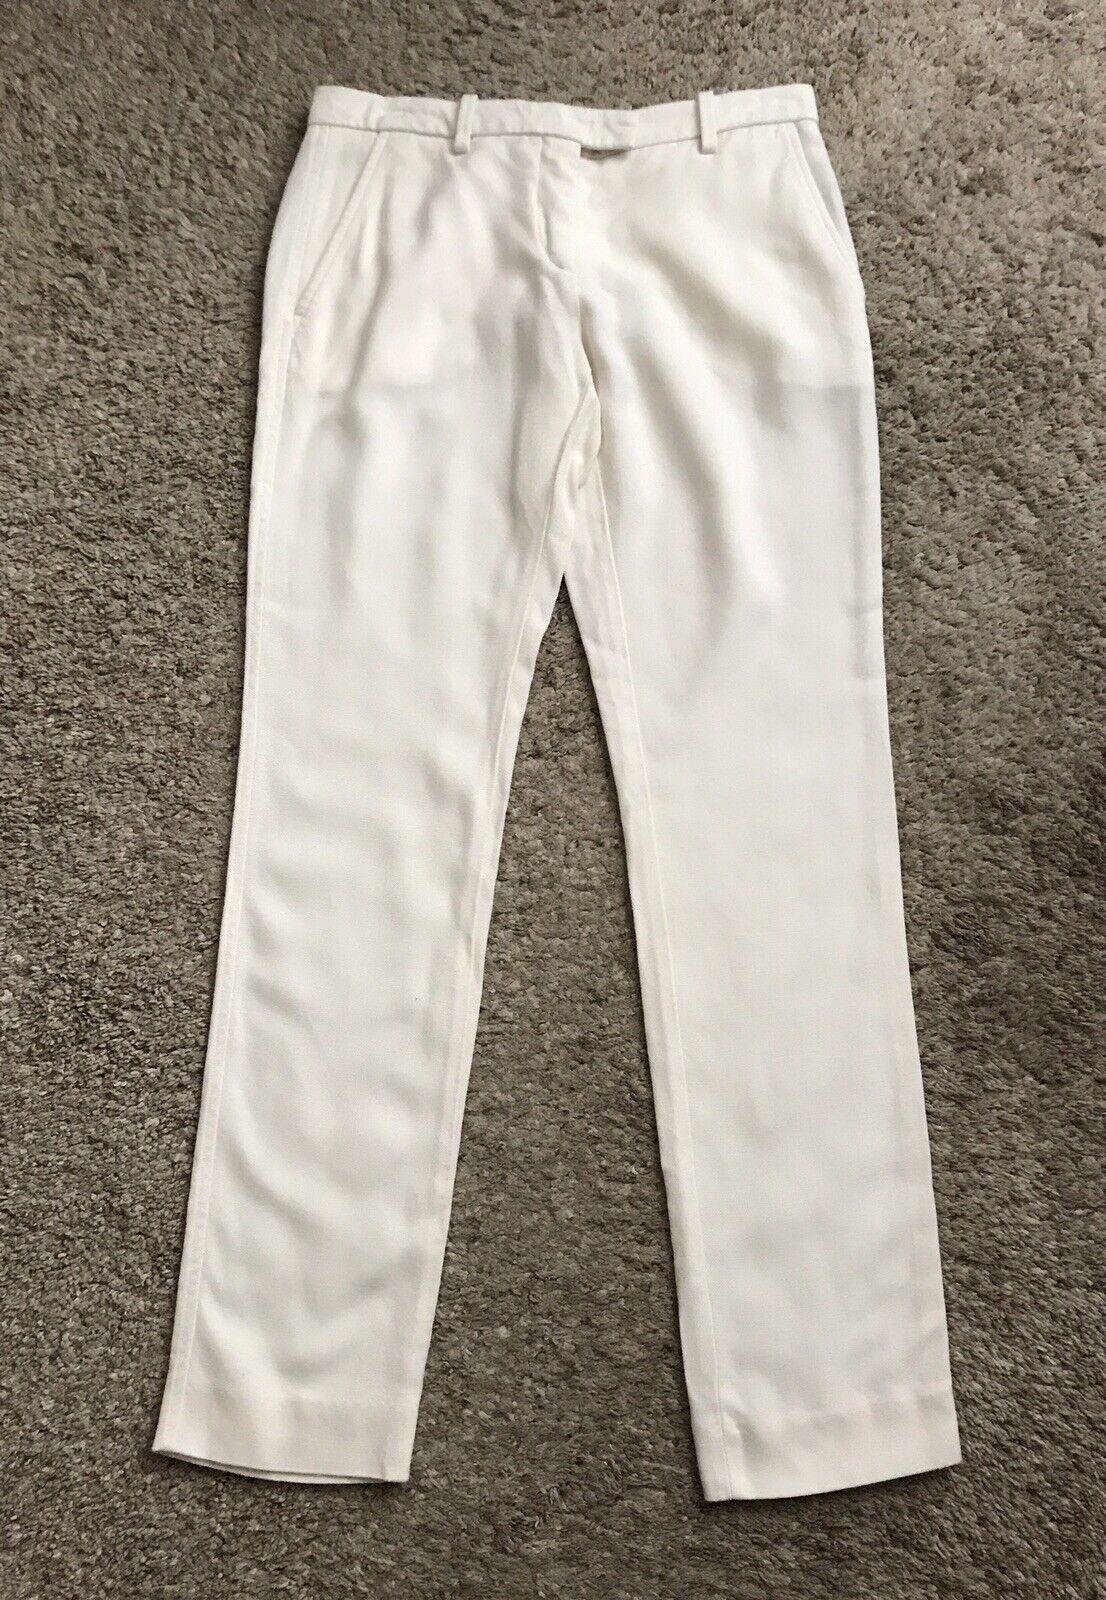 ISABEL MARANT Womens Size 2 Cream White Straight Leg Dress Pants 32  Inseam